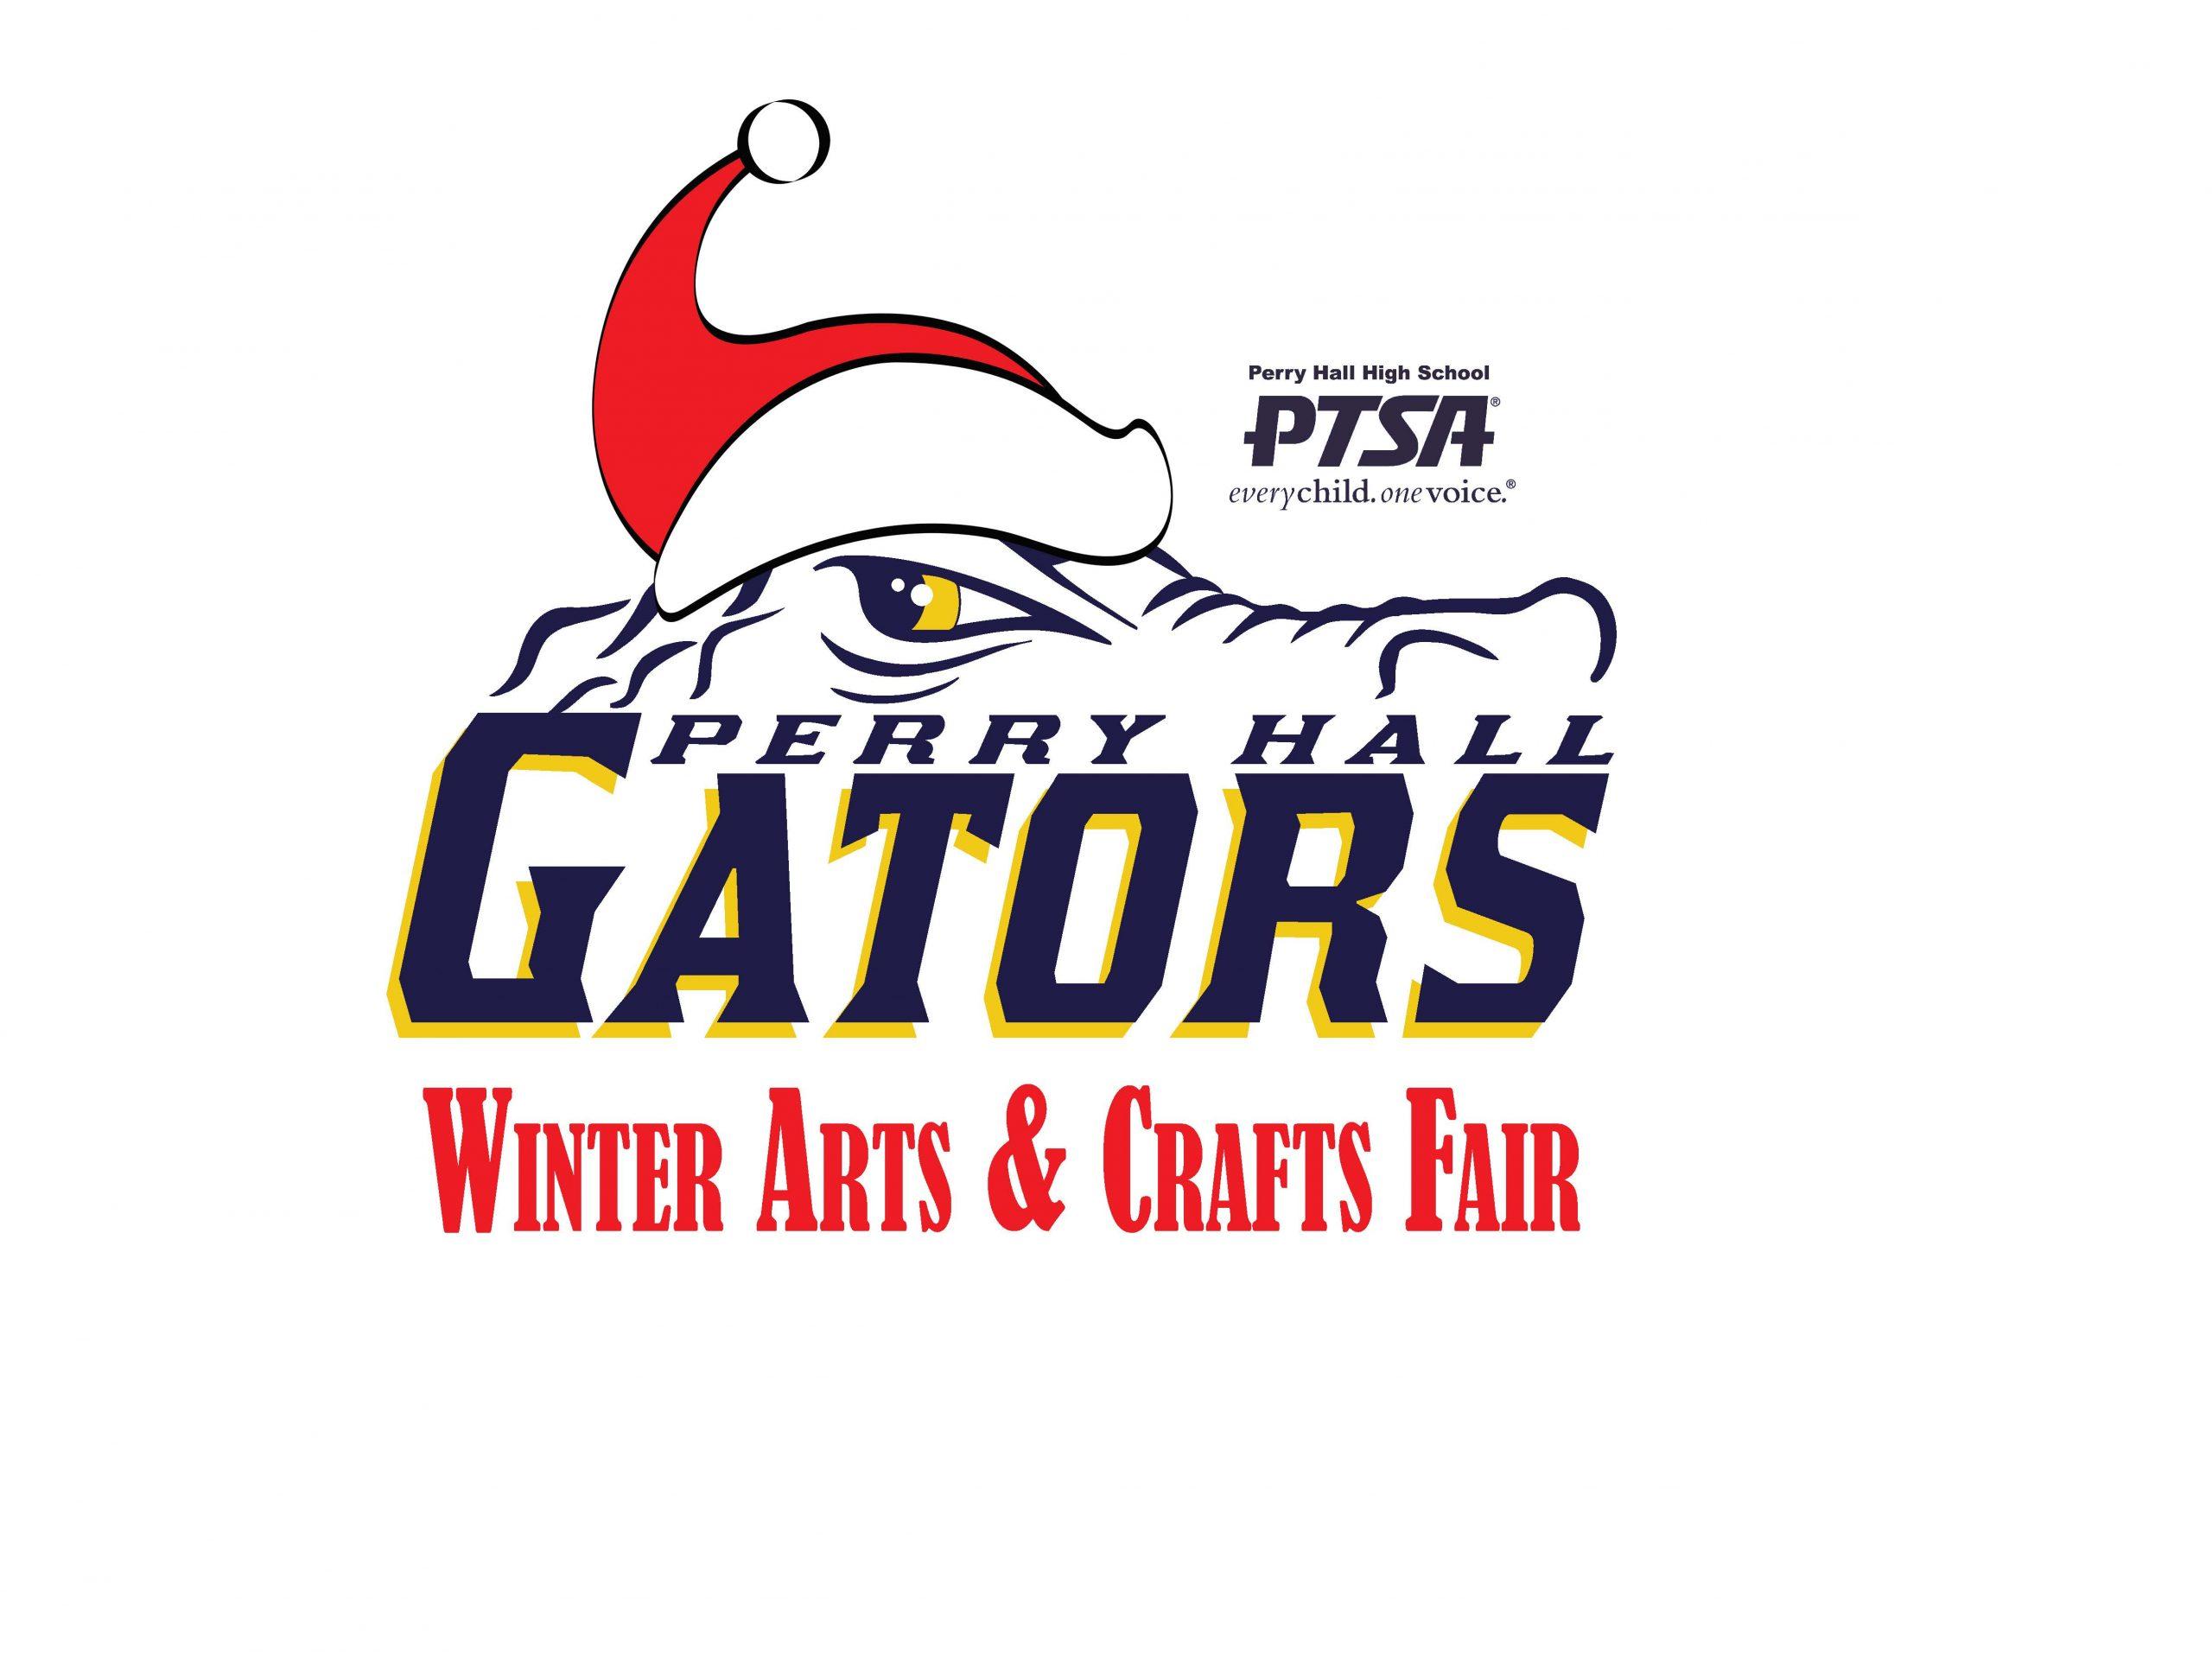 Perry Hall High School PTSA Craft Fair